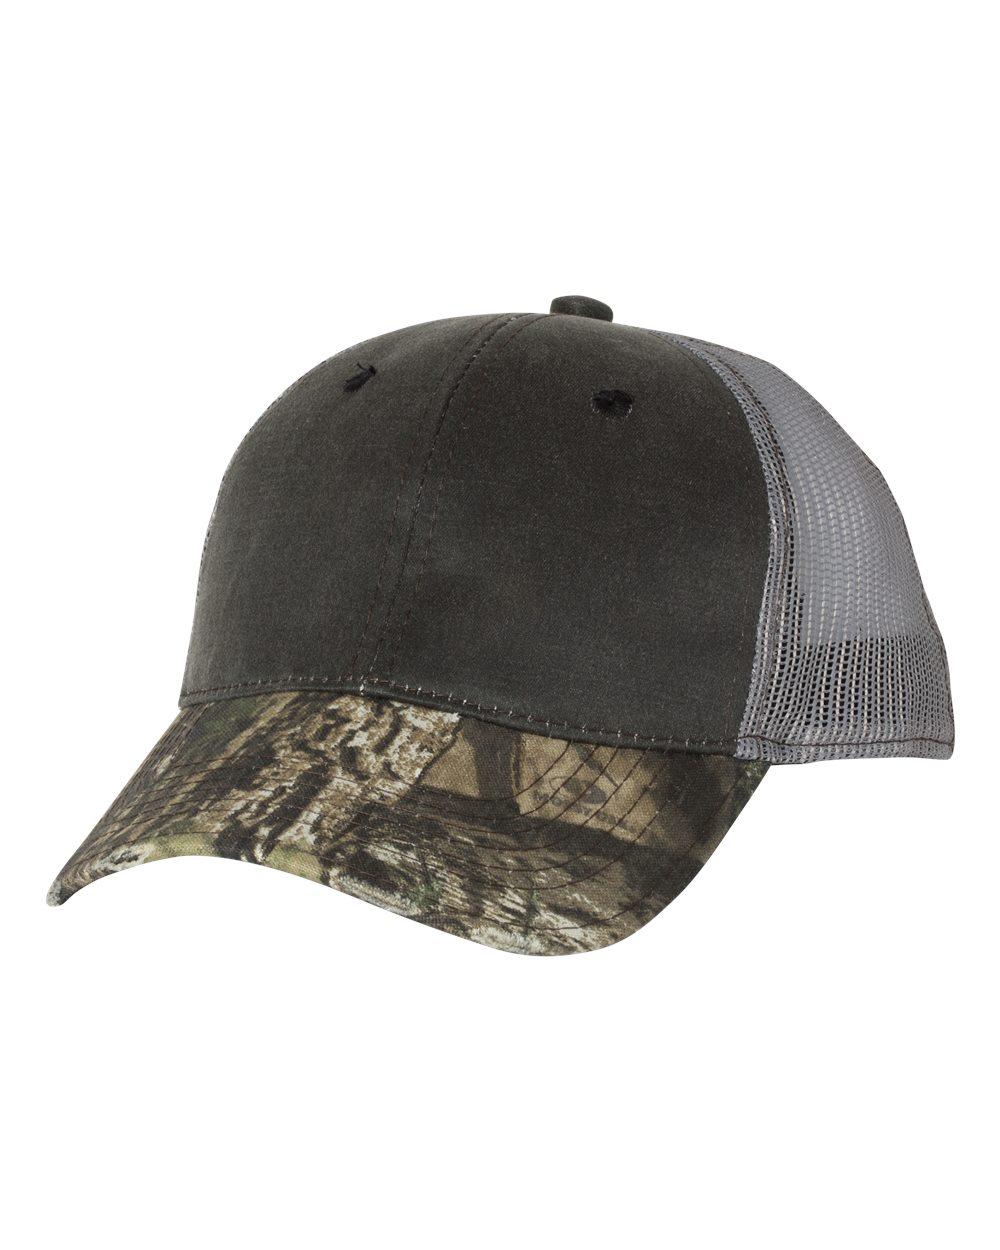 Outdoor Cap HPC500M - Distressed Camo Mesh-Back Cap